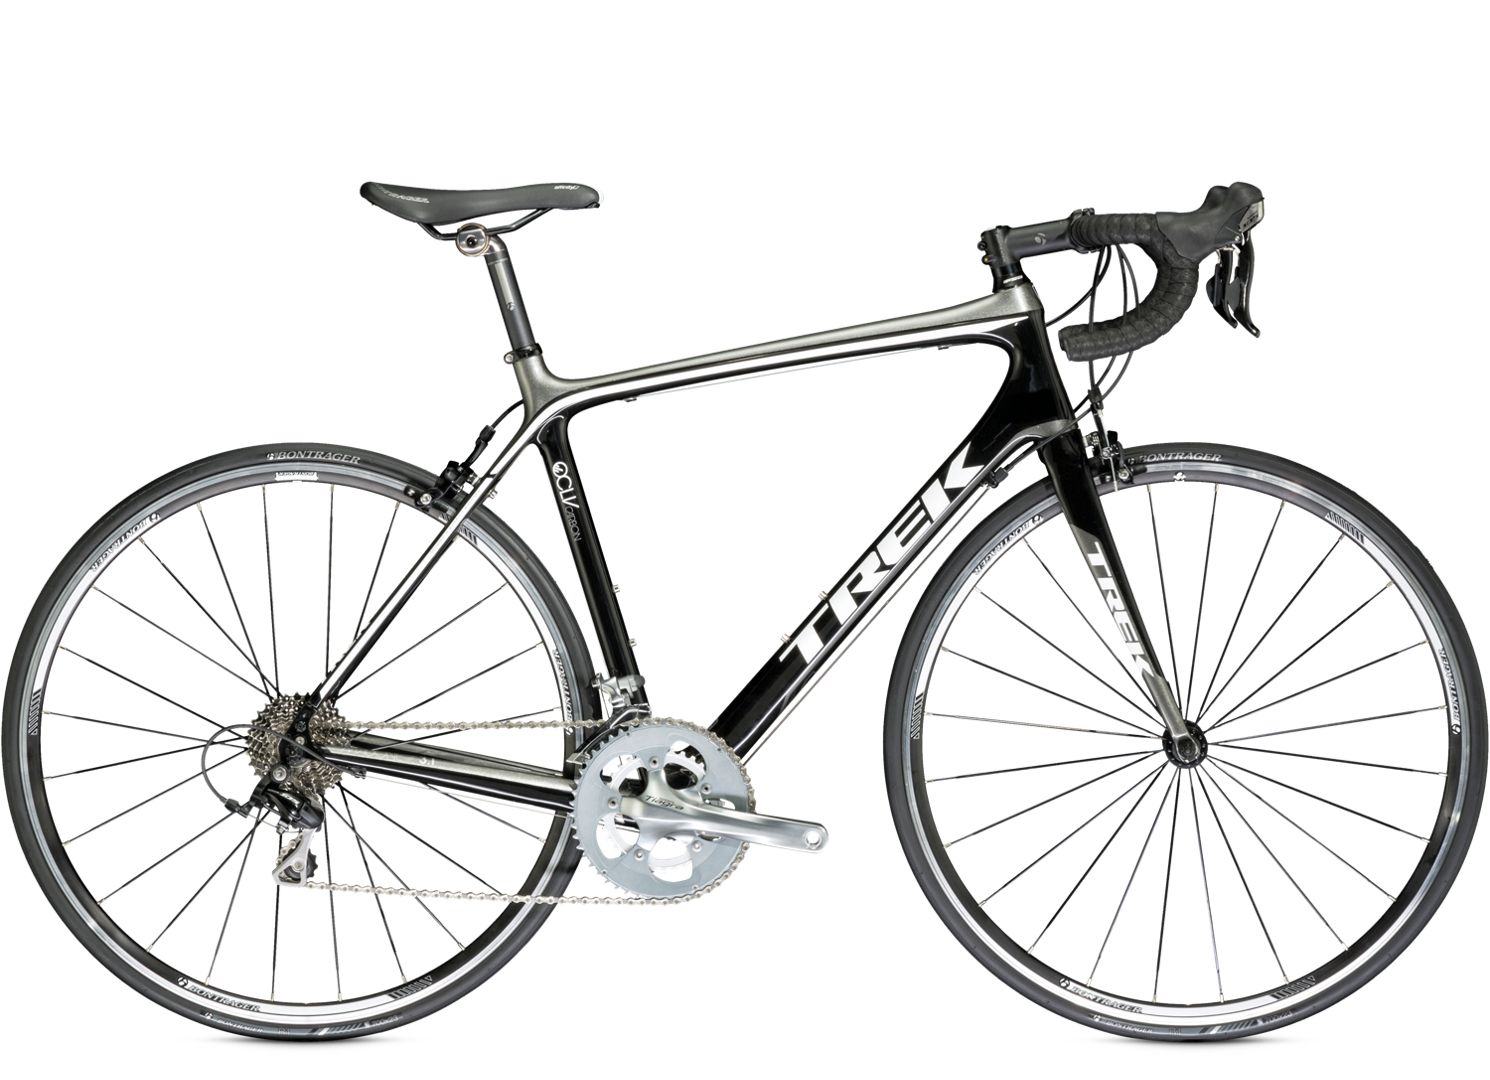 Trek Madone 3 1 Road Bike 2014 Trek Bicycle Trek Bikes Trek